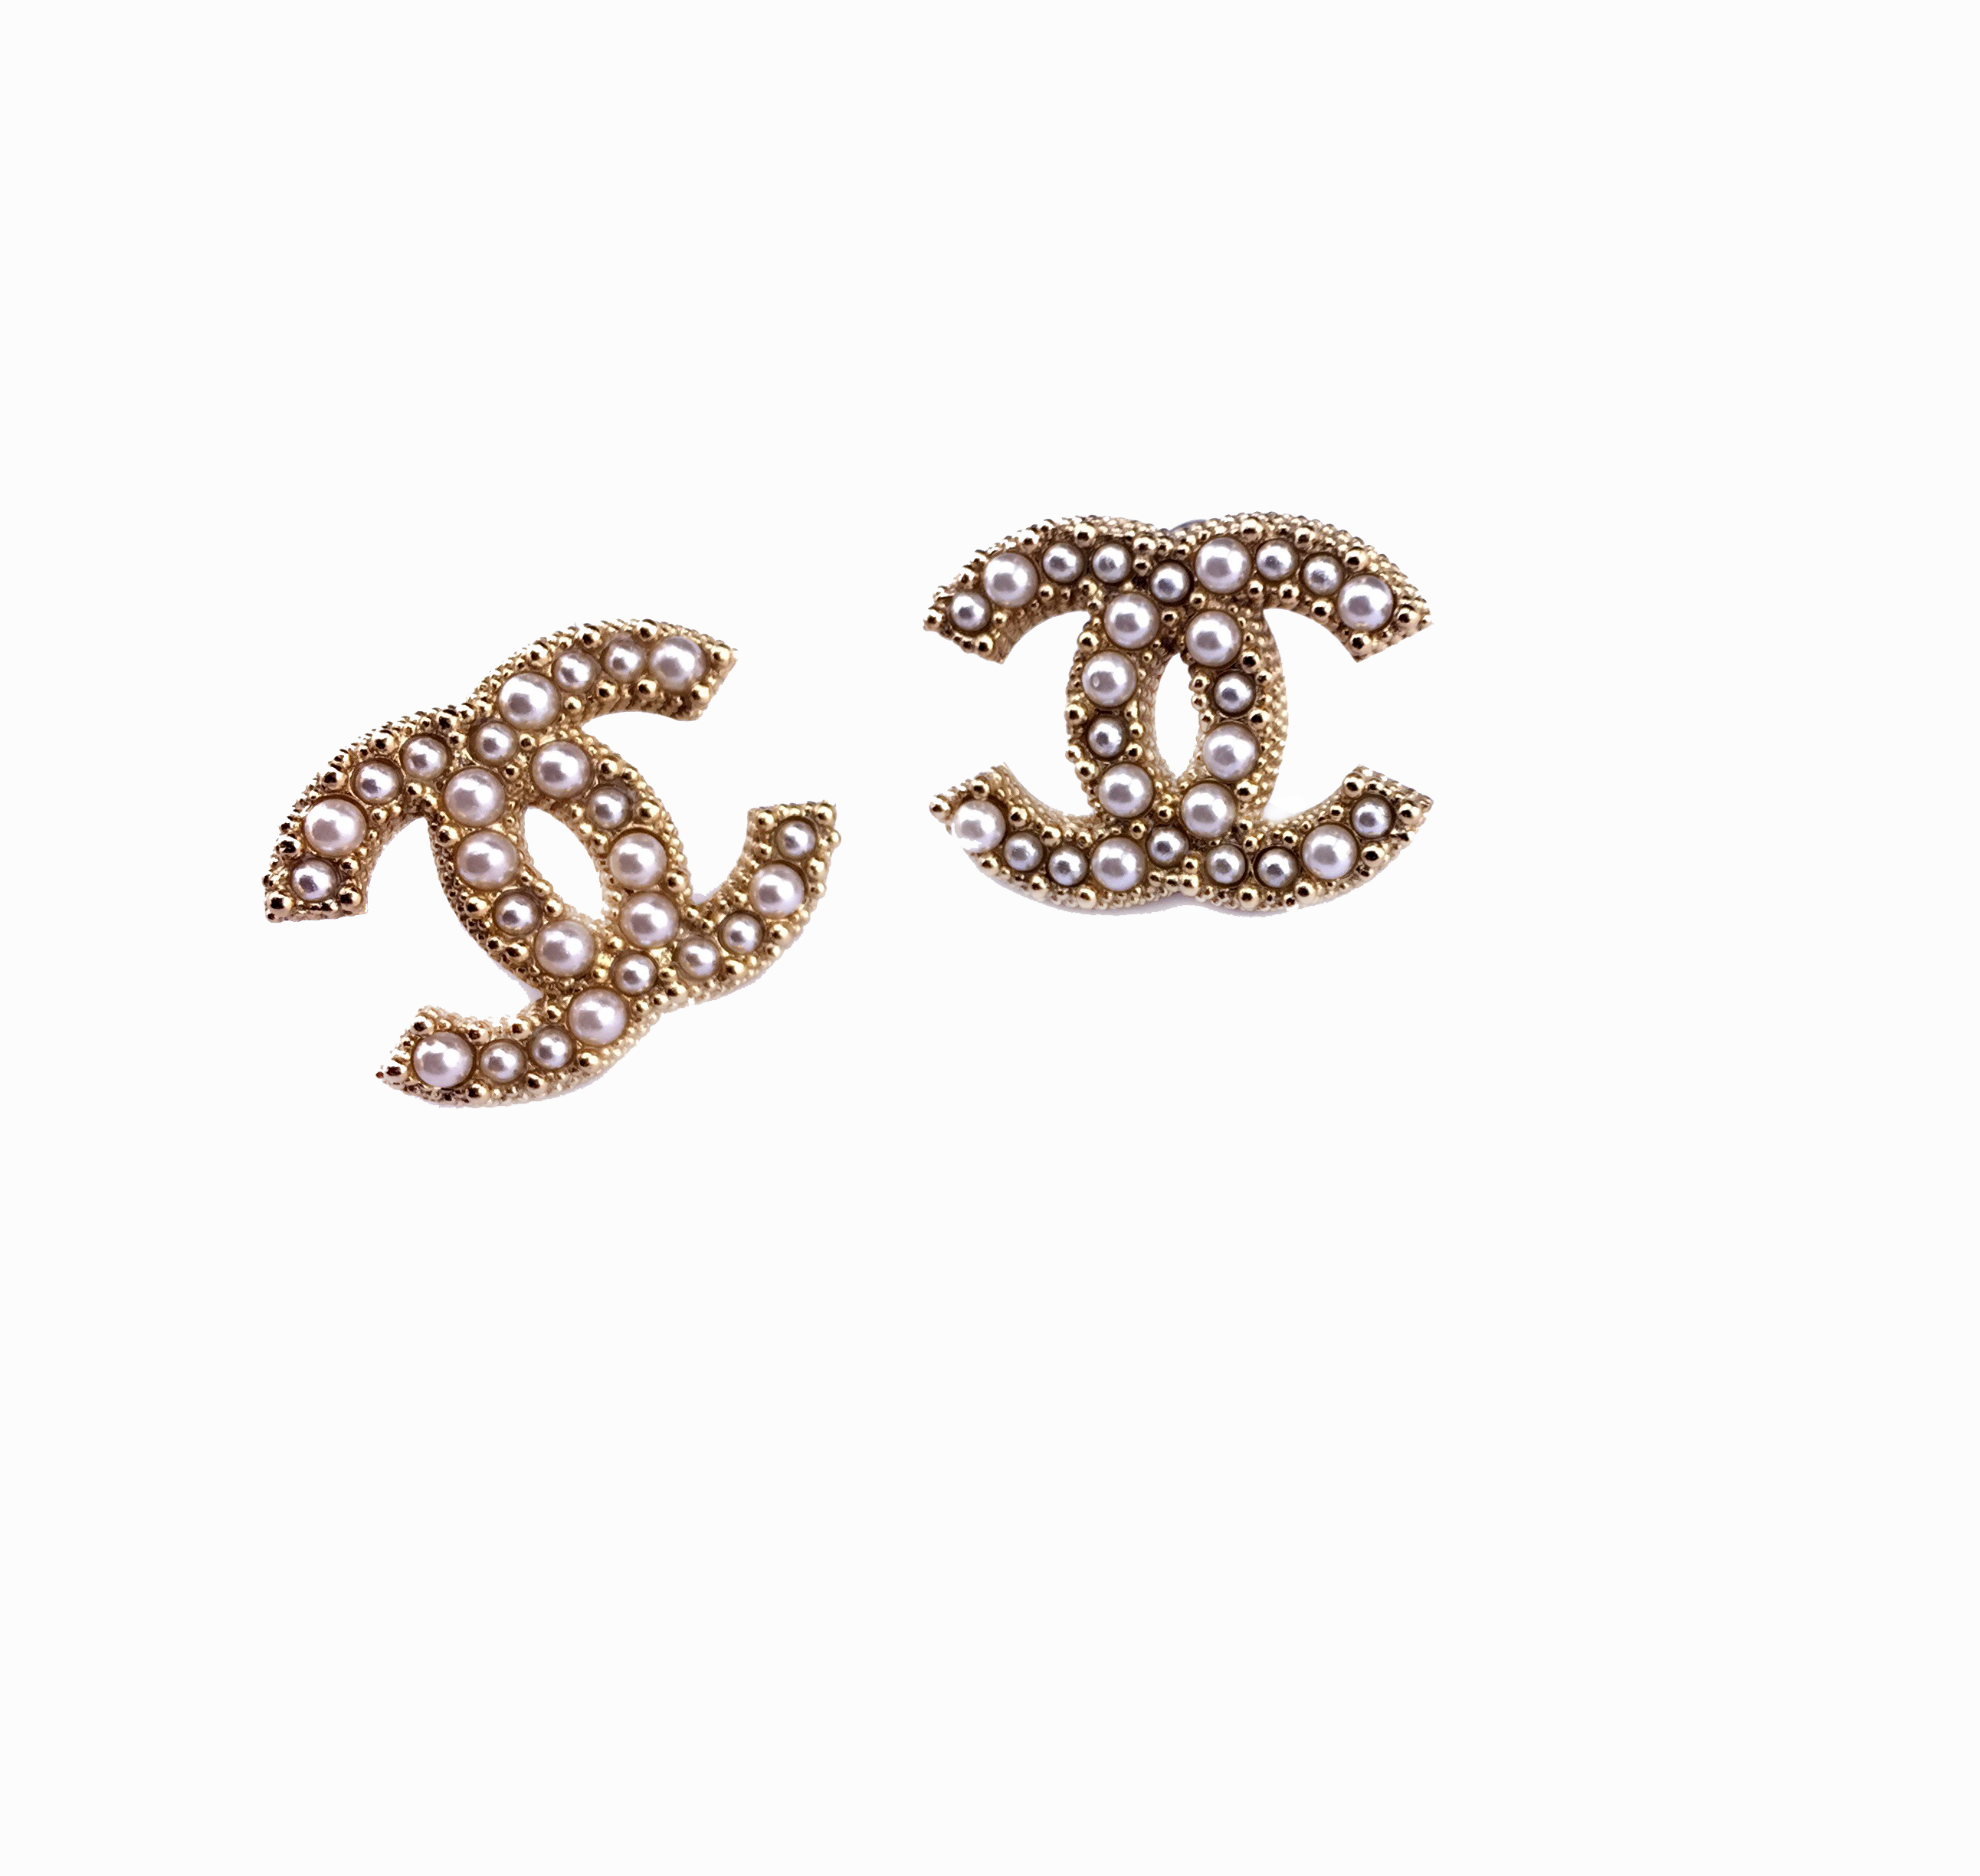 Pearl Stud Earrings Inspired Chanel